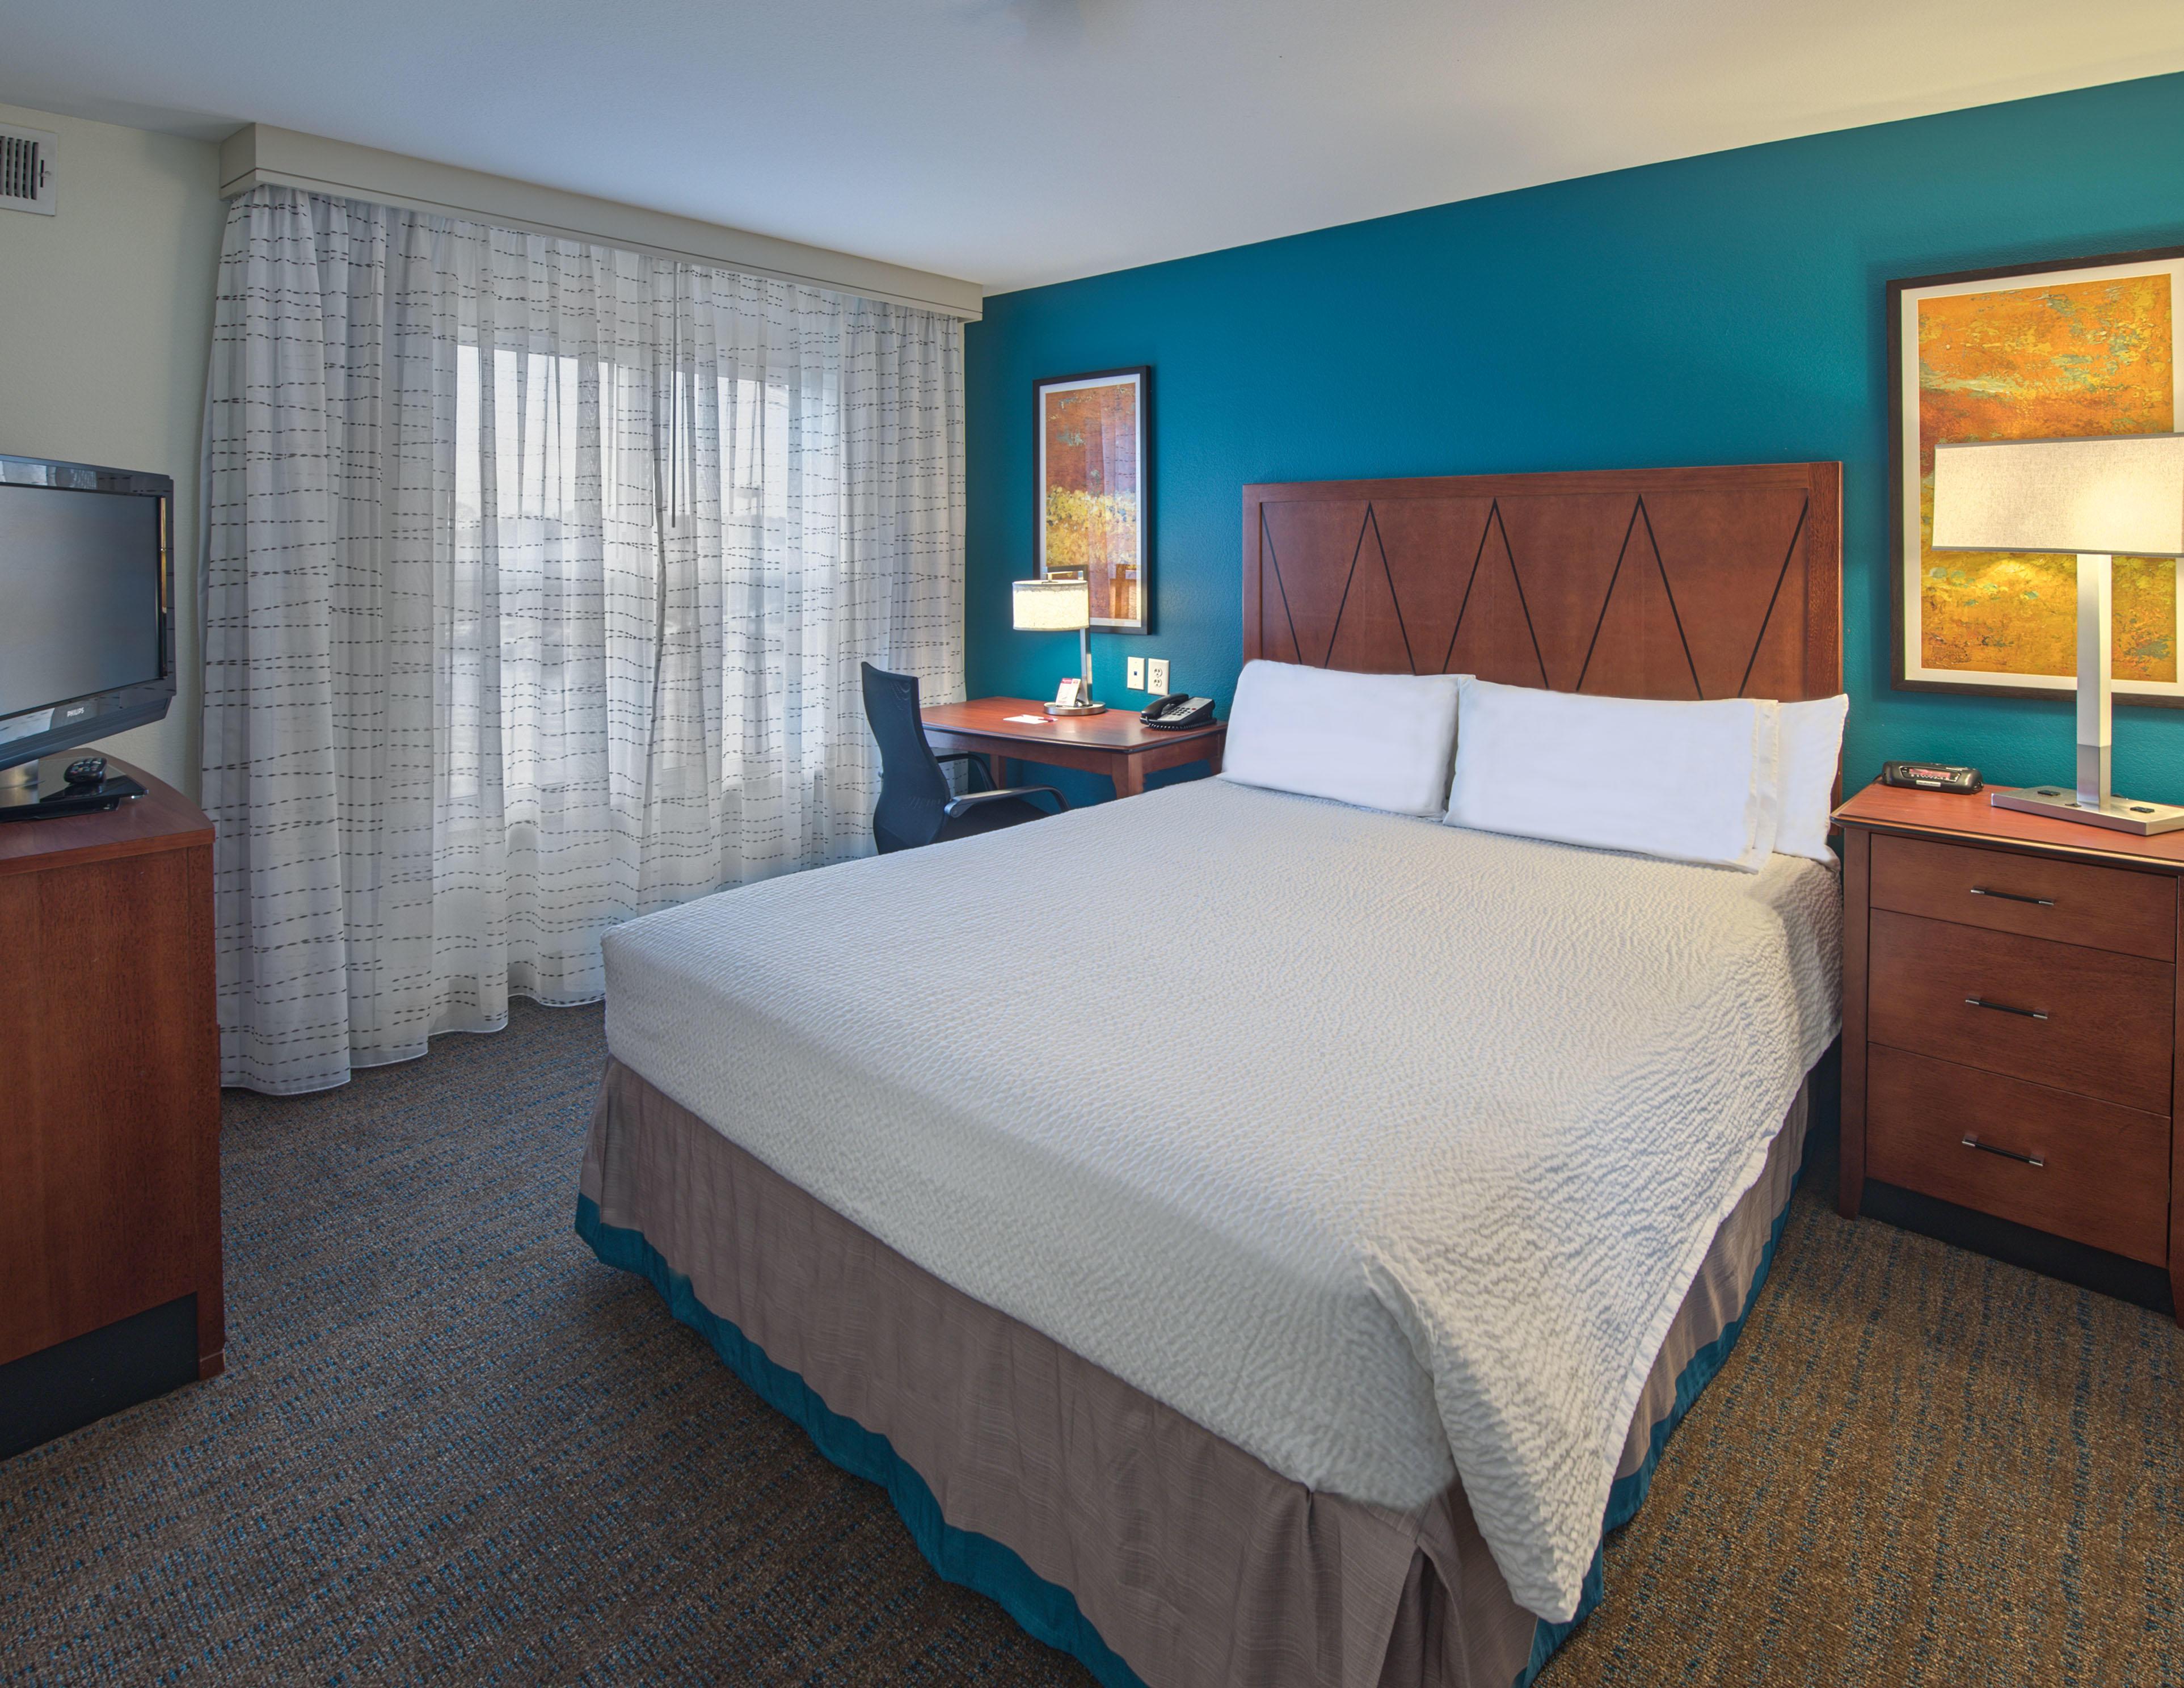 Residence Inn by Marriott Fayetteville Cross Creek image 2